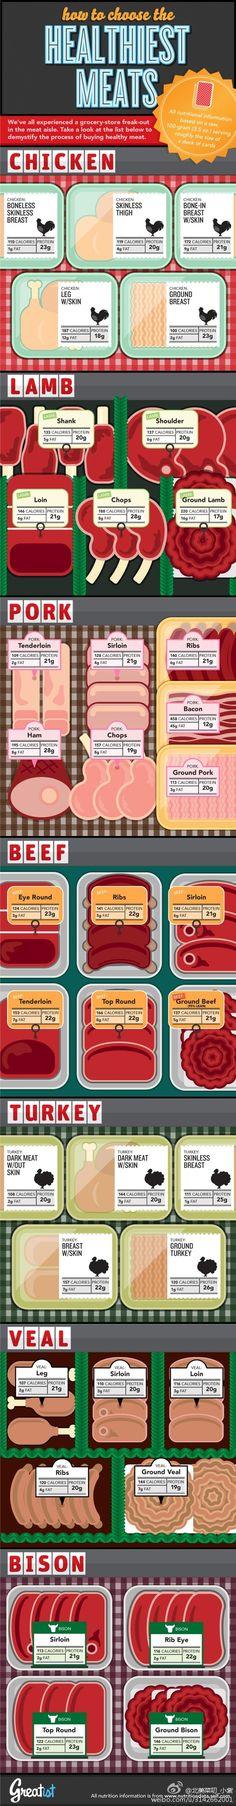 healthiest meat